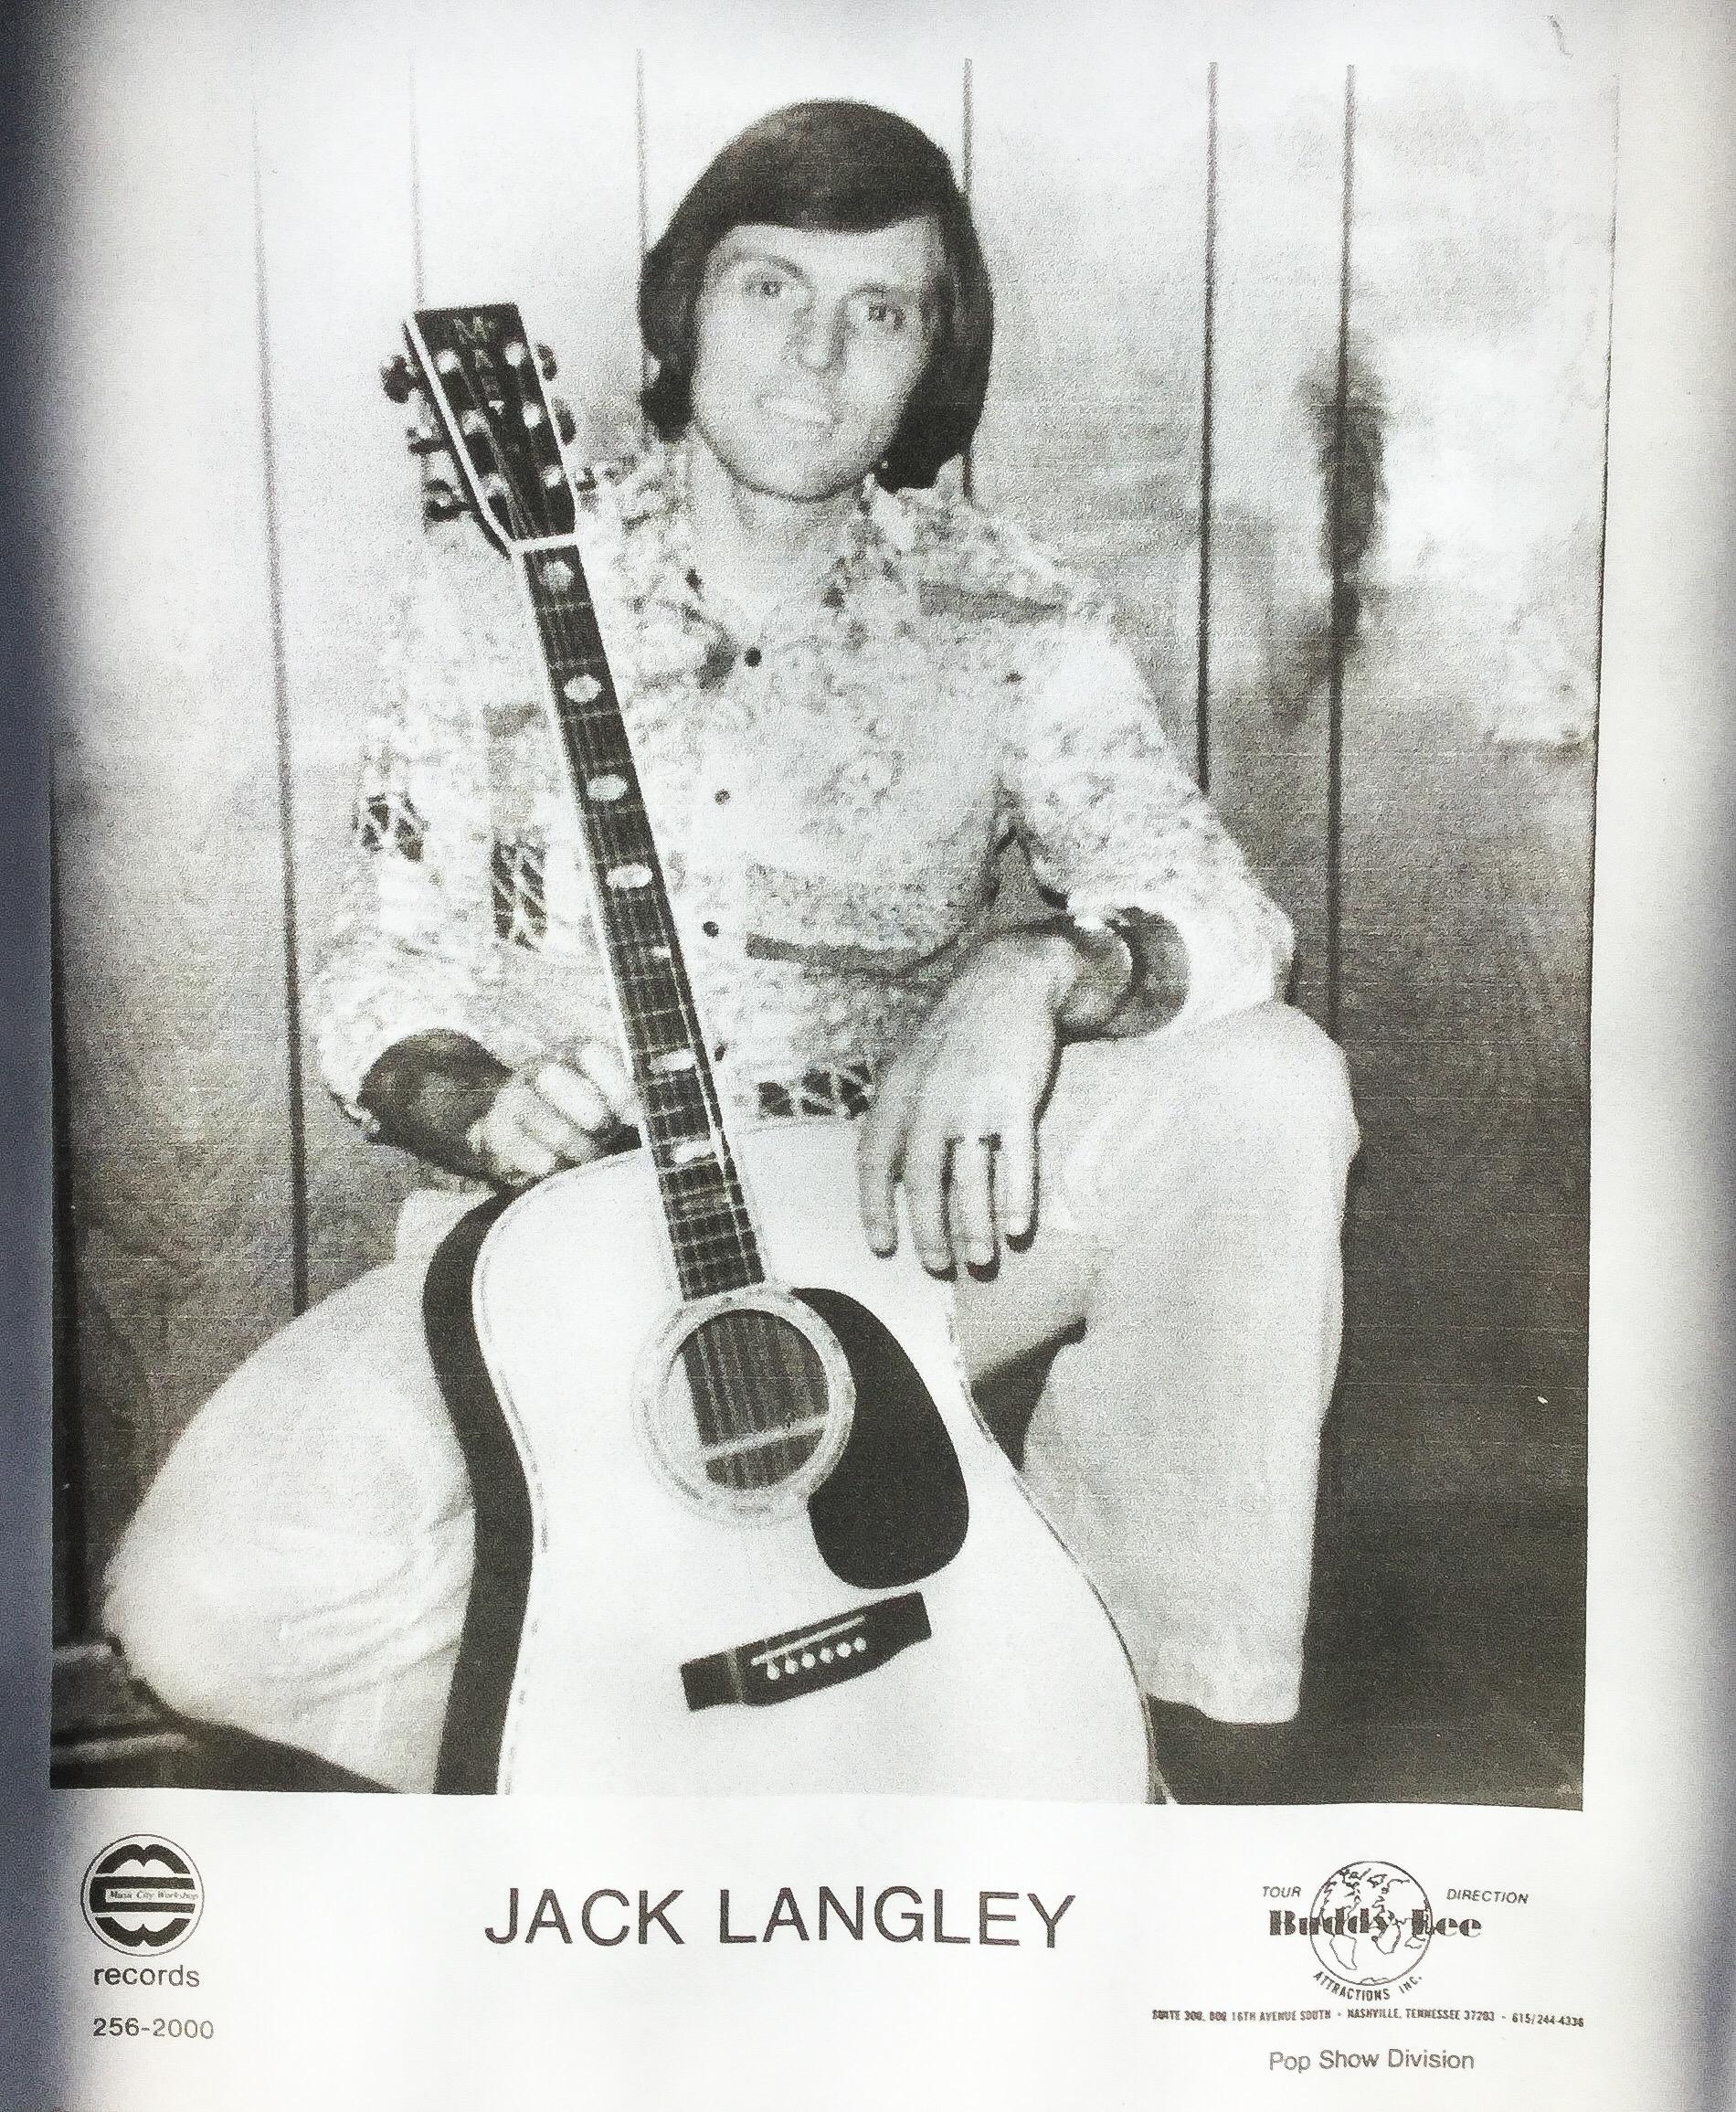 Jack Langley